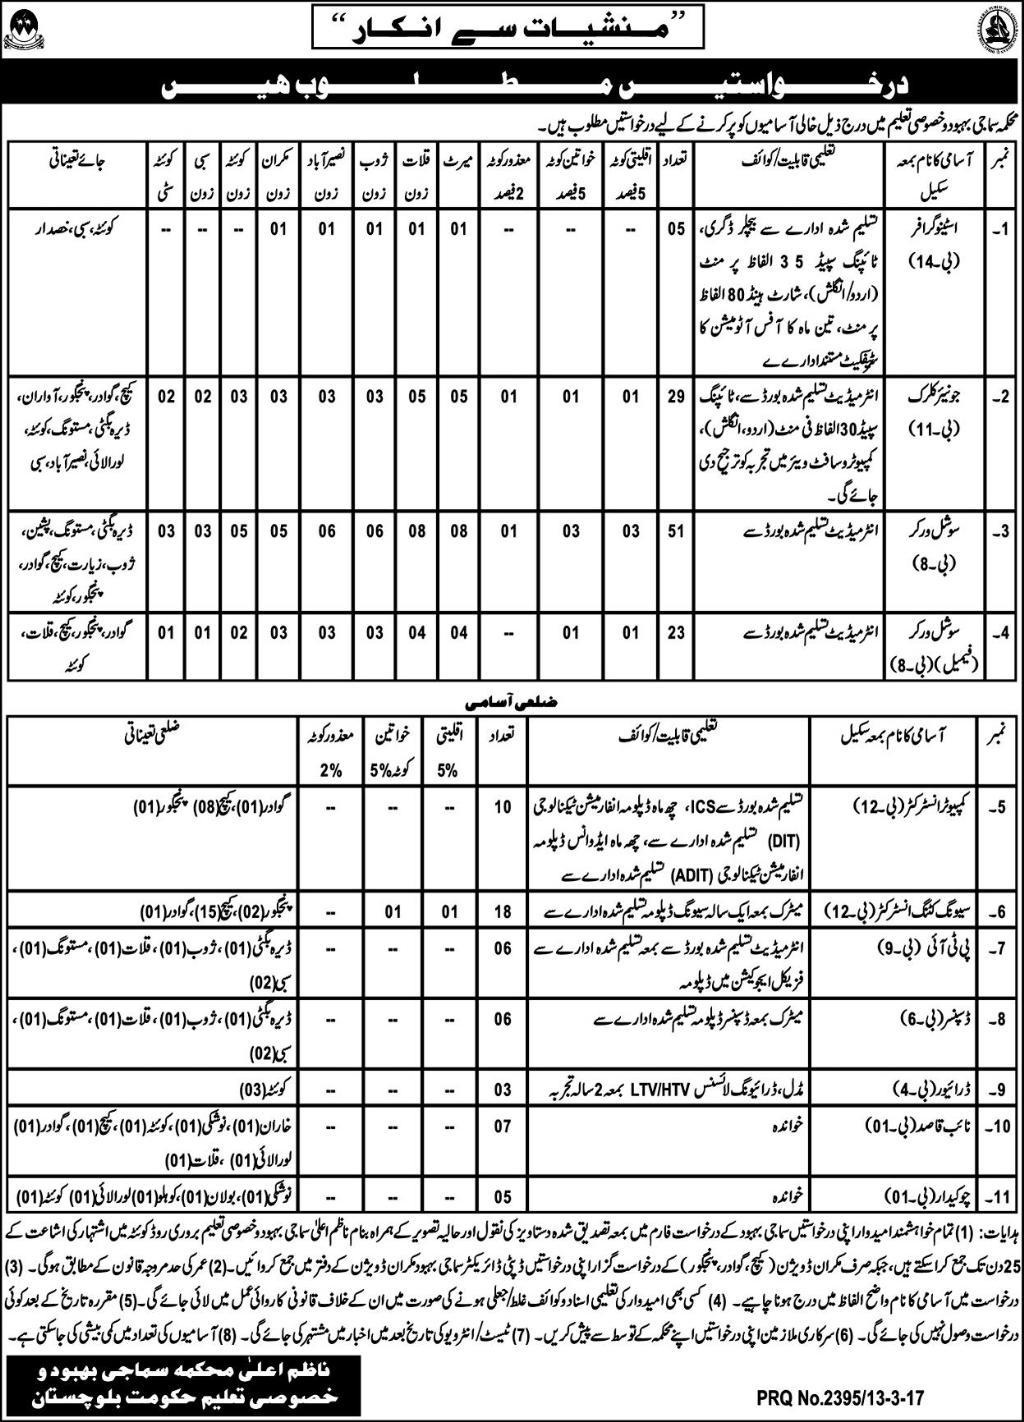 pw-exp  Th P Govt Job Online Form on